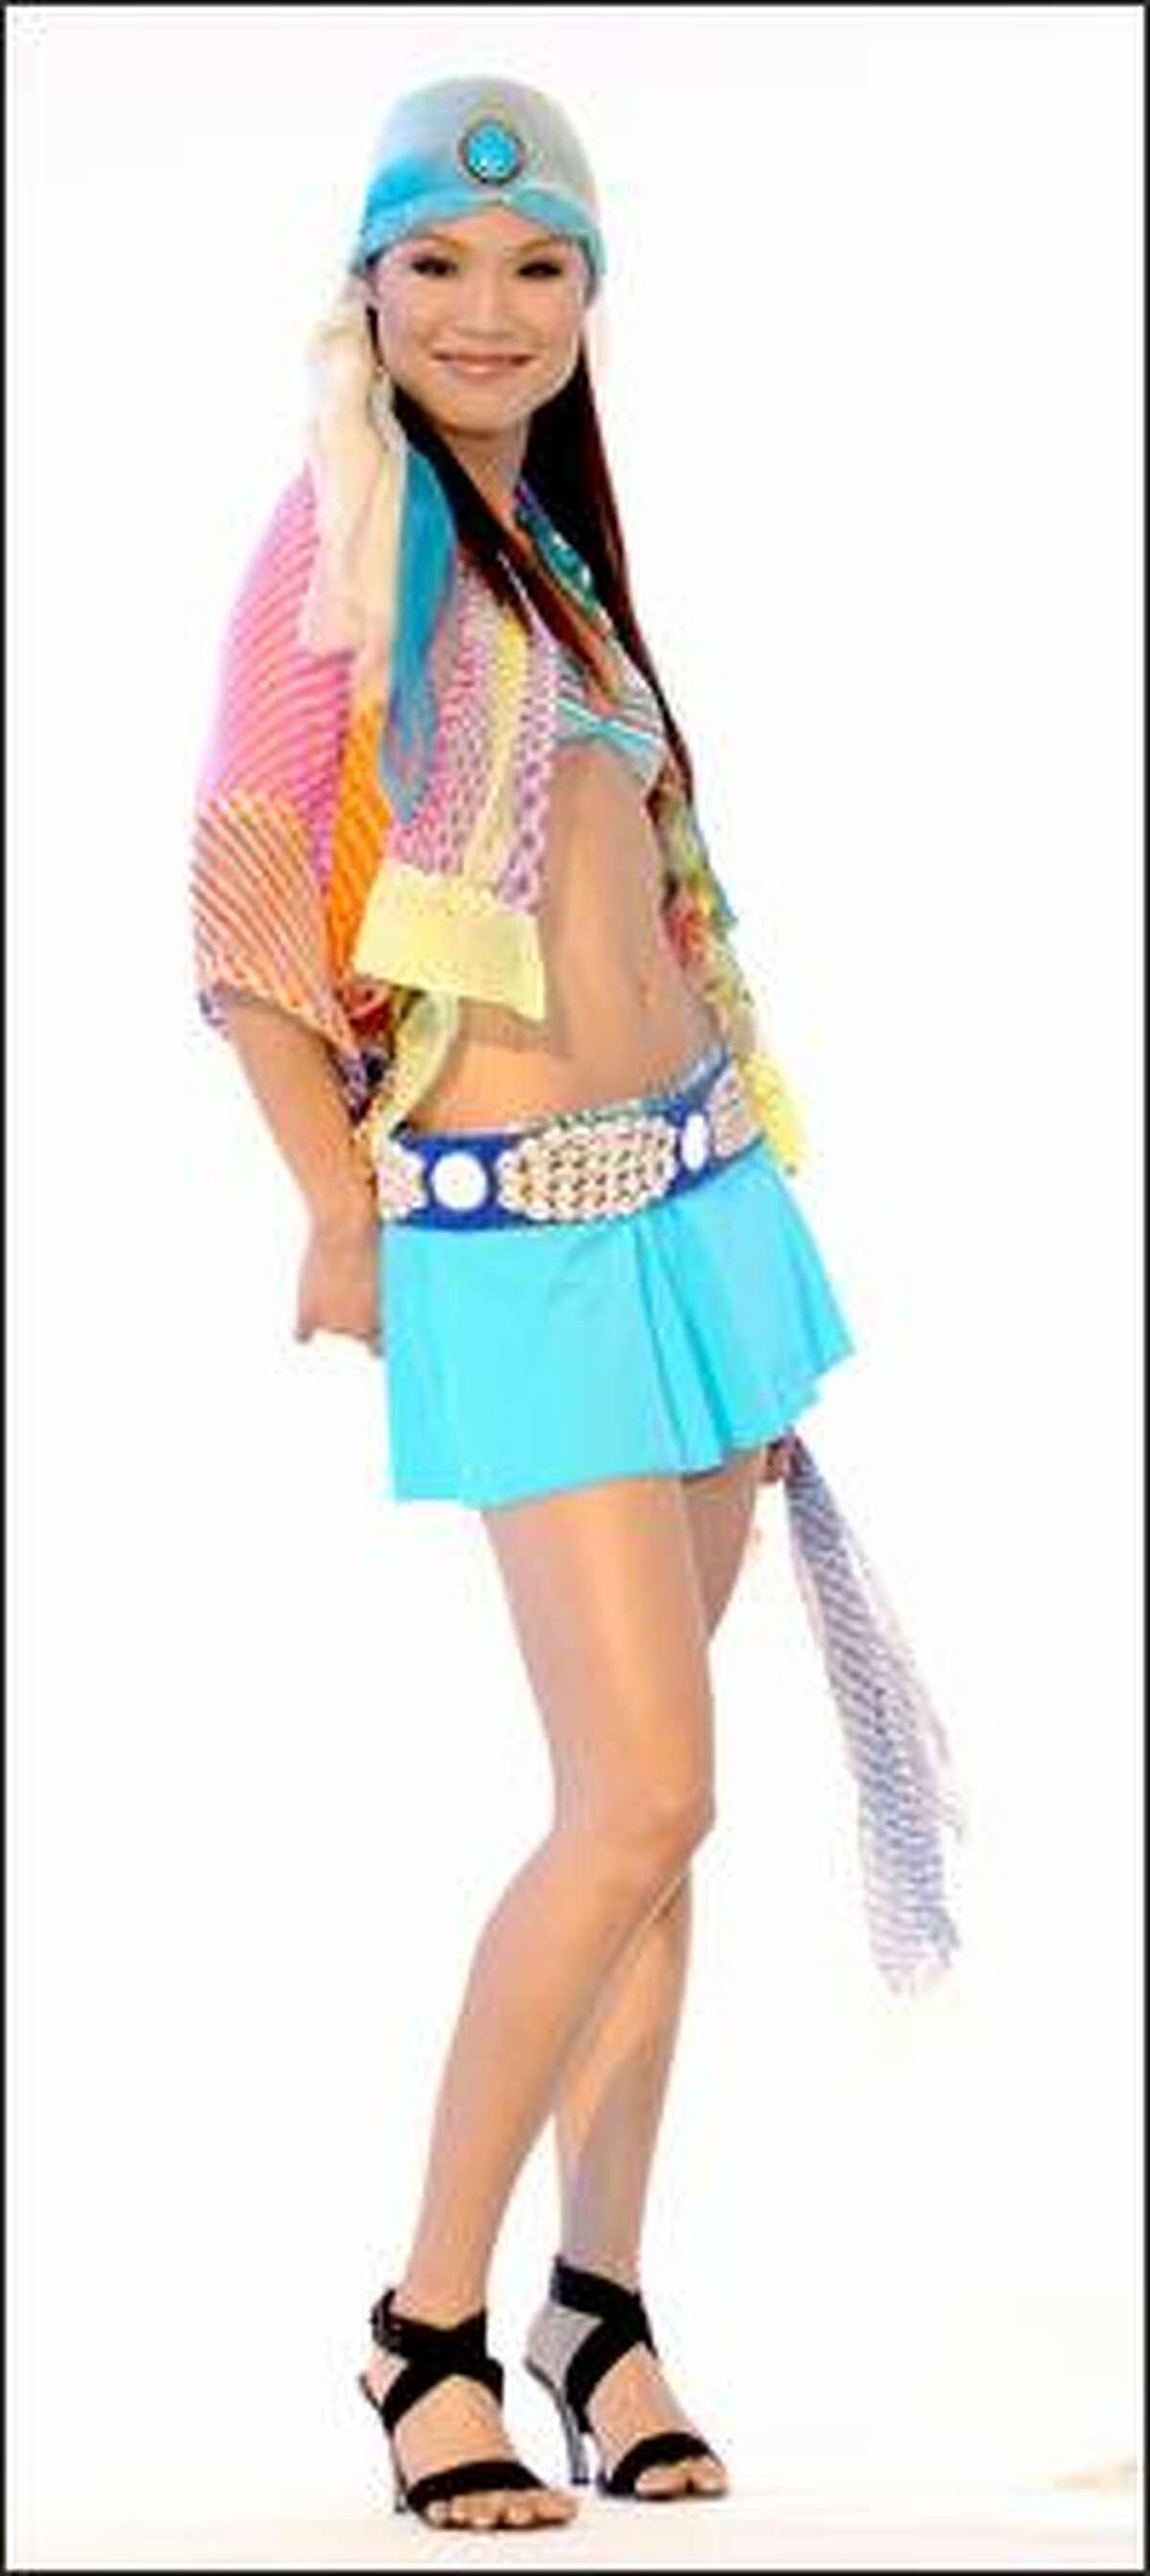 Cheryl Tay, Miss Singapore.